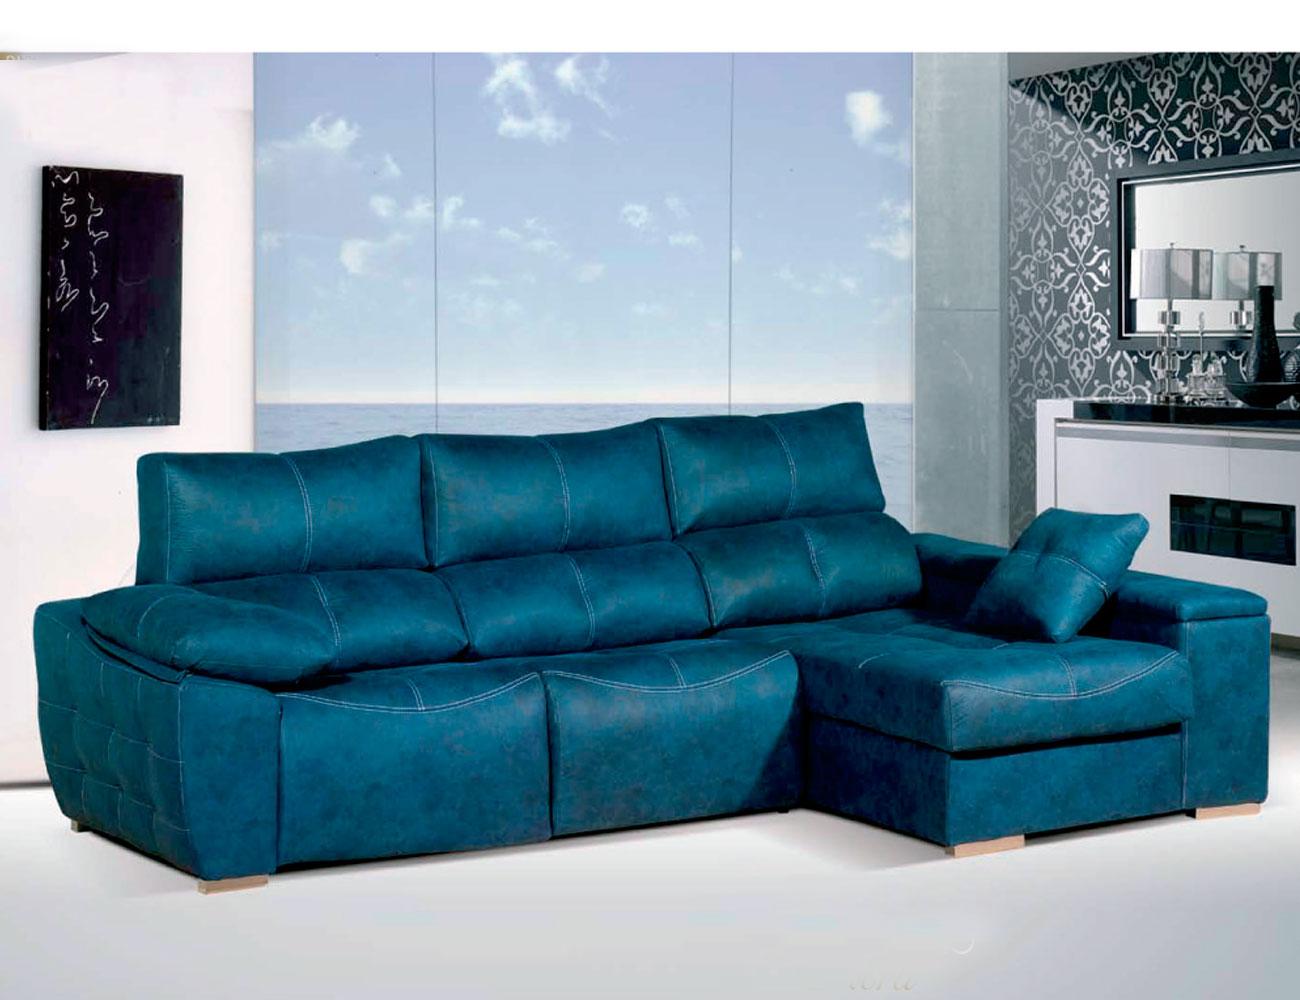 Sofa chaiselongue relax 2 motores anti manchas turquesa44